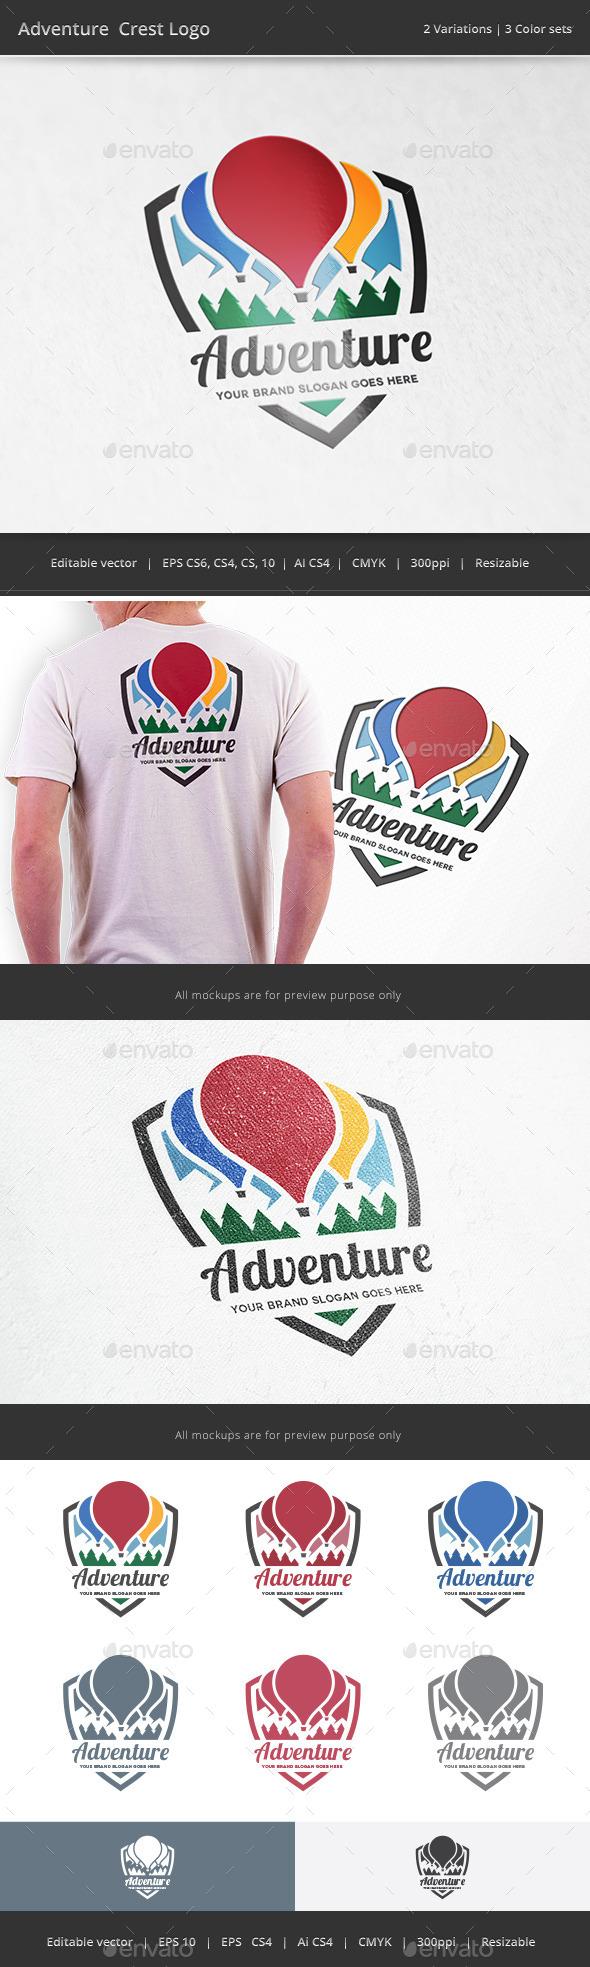 Adventure Crest Logo - Crests Logo Templates